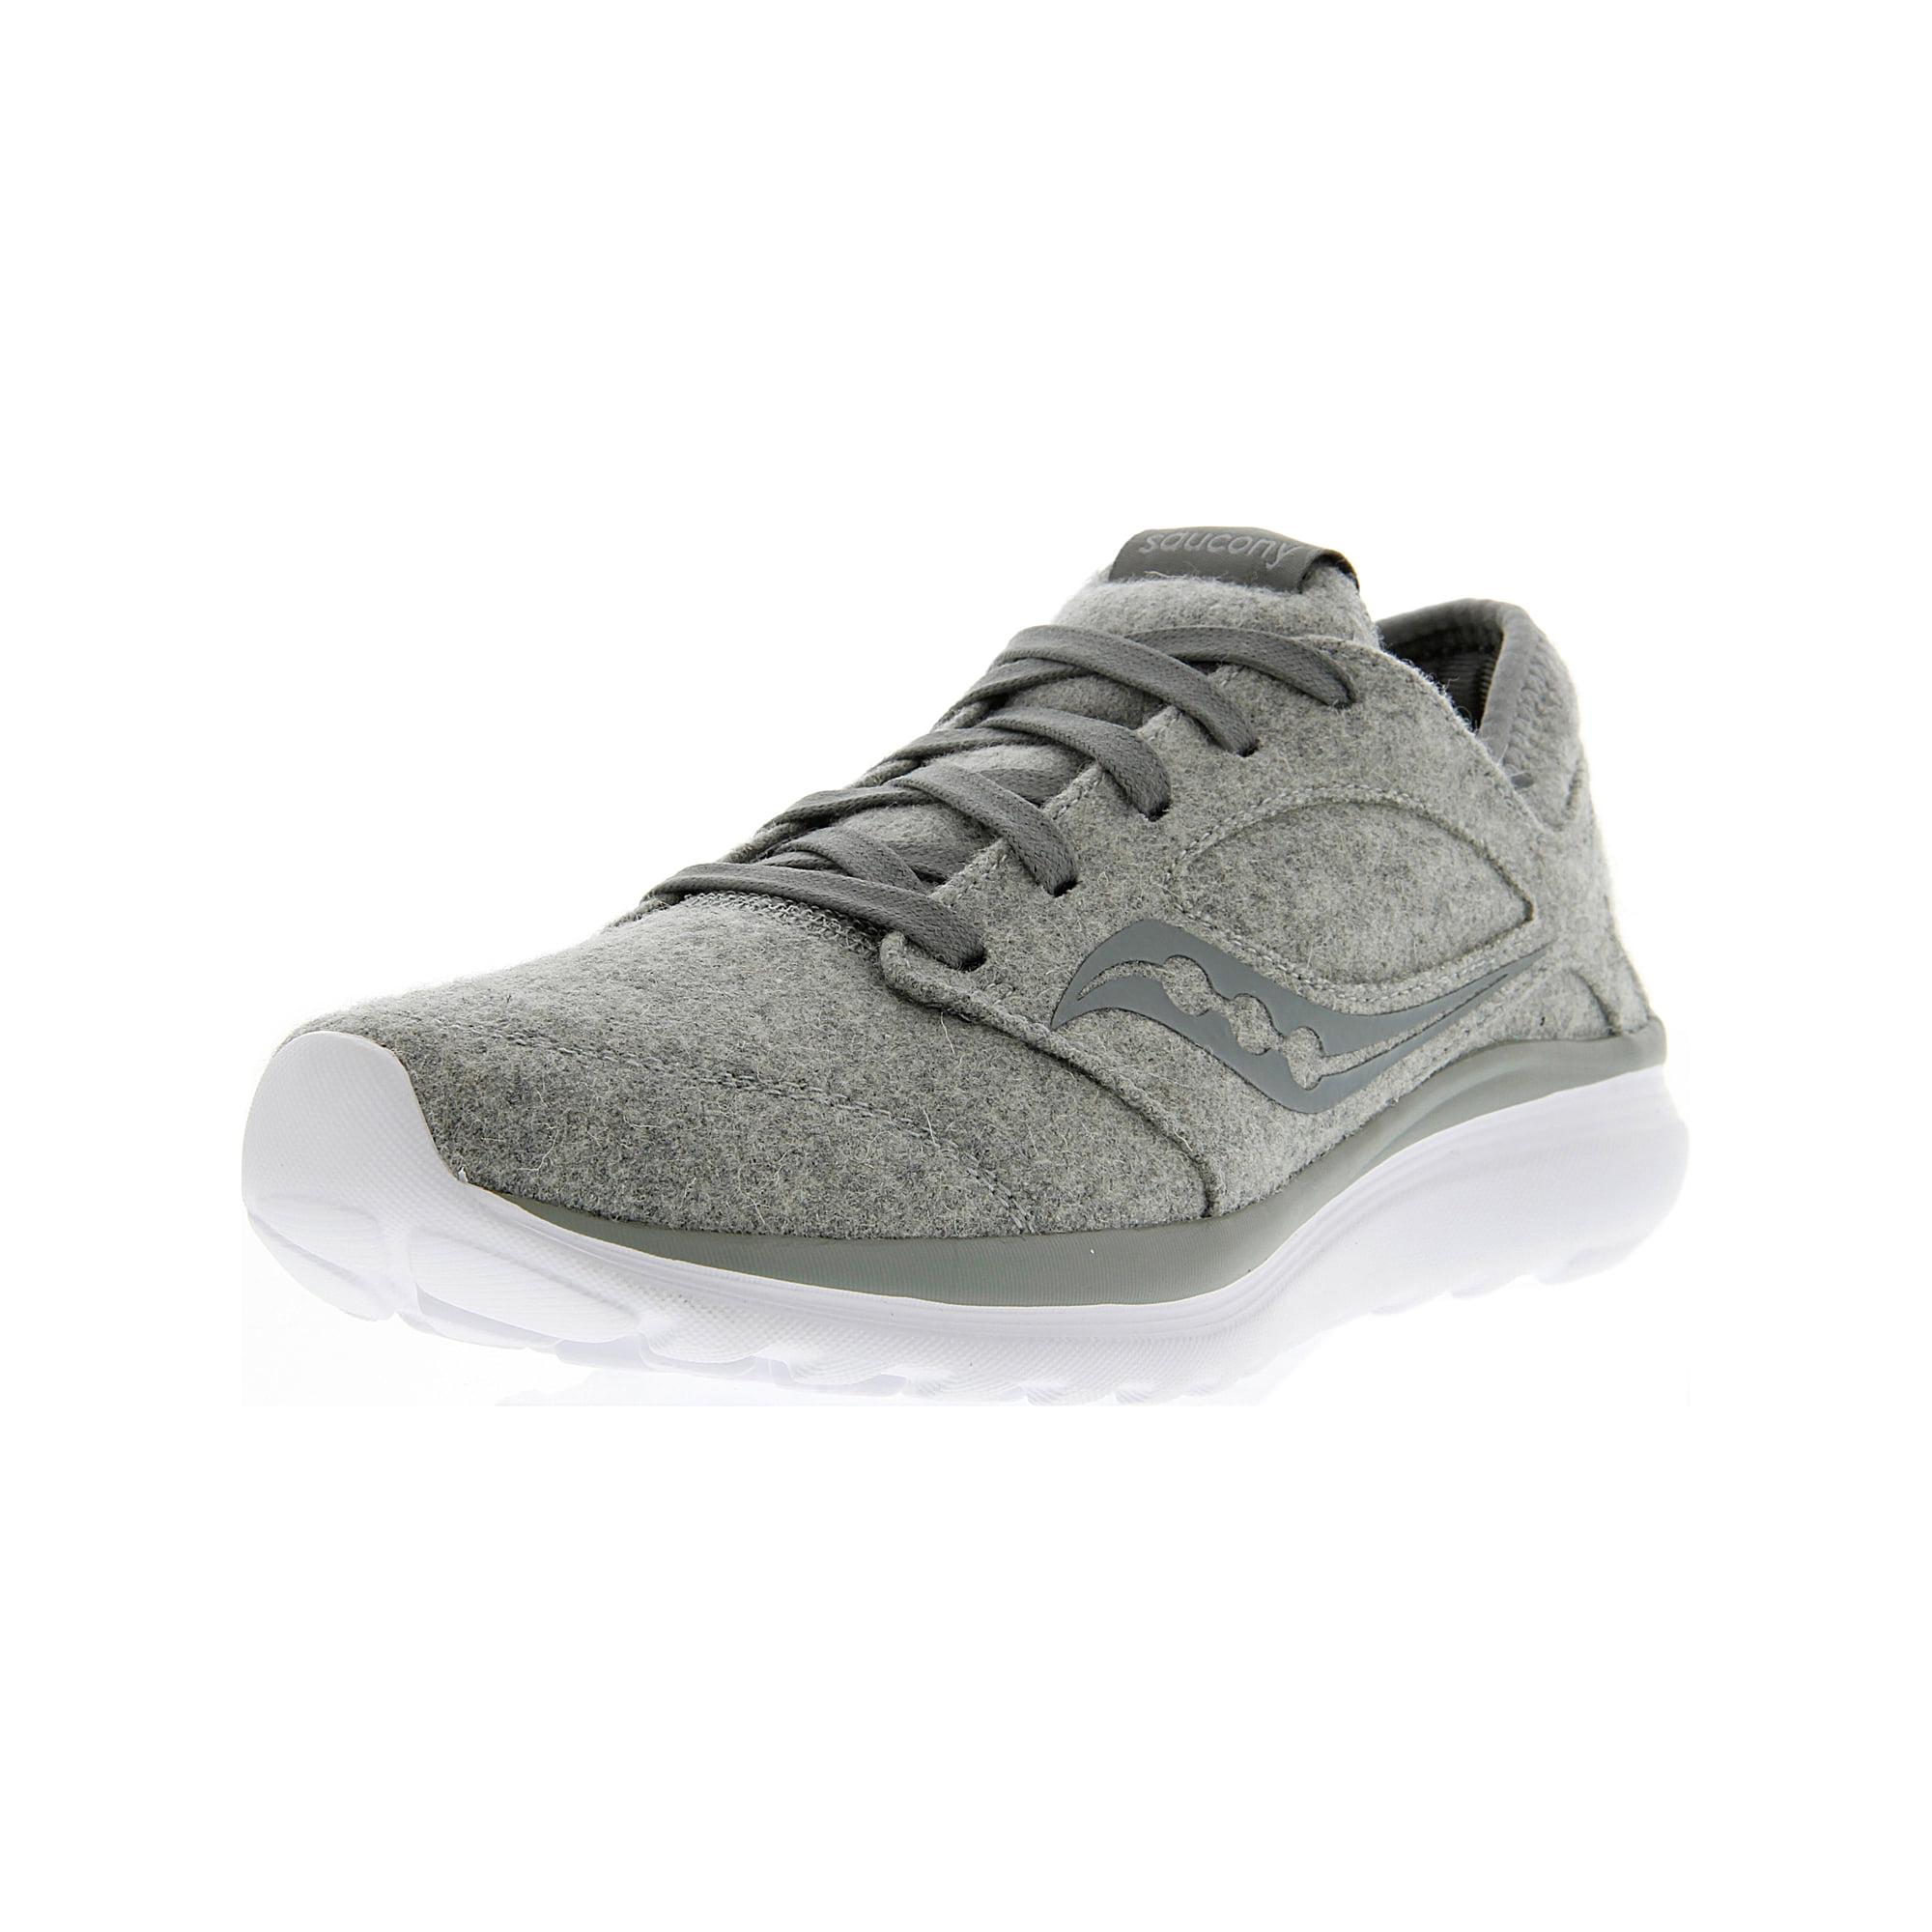 52b5a18cad Saucony Women's Kineta Relay Wool Grey Ankle-High Running Shoe - 8M ...